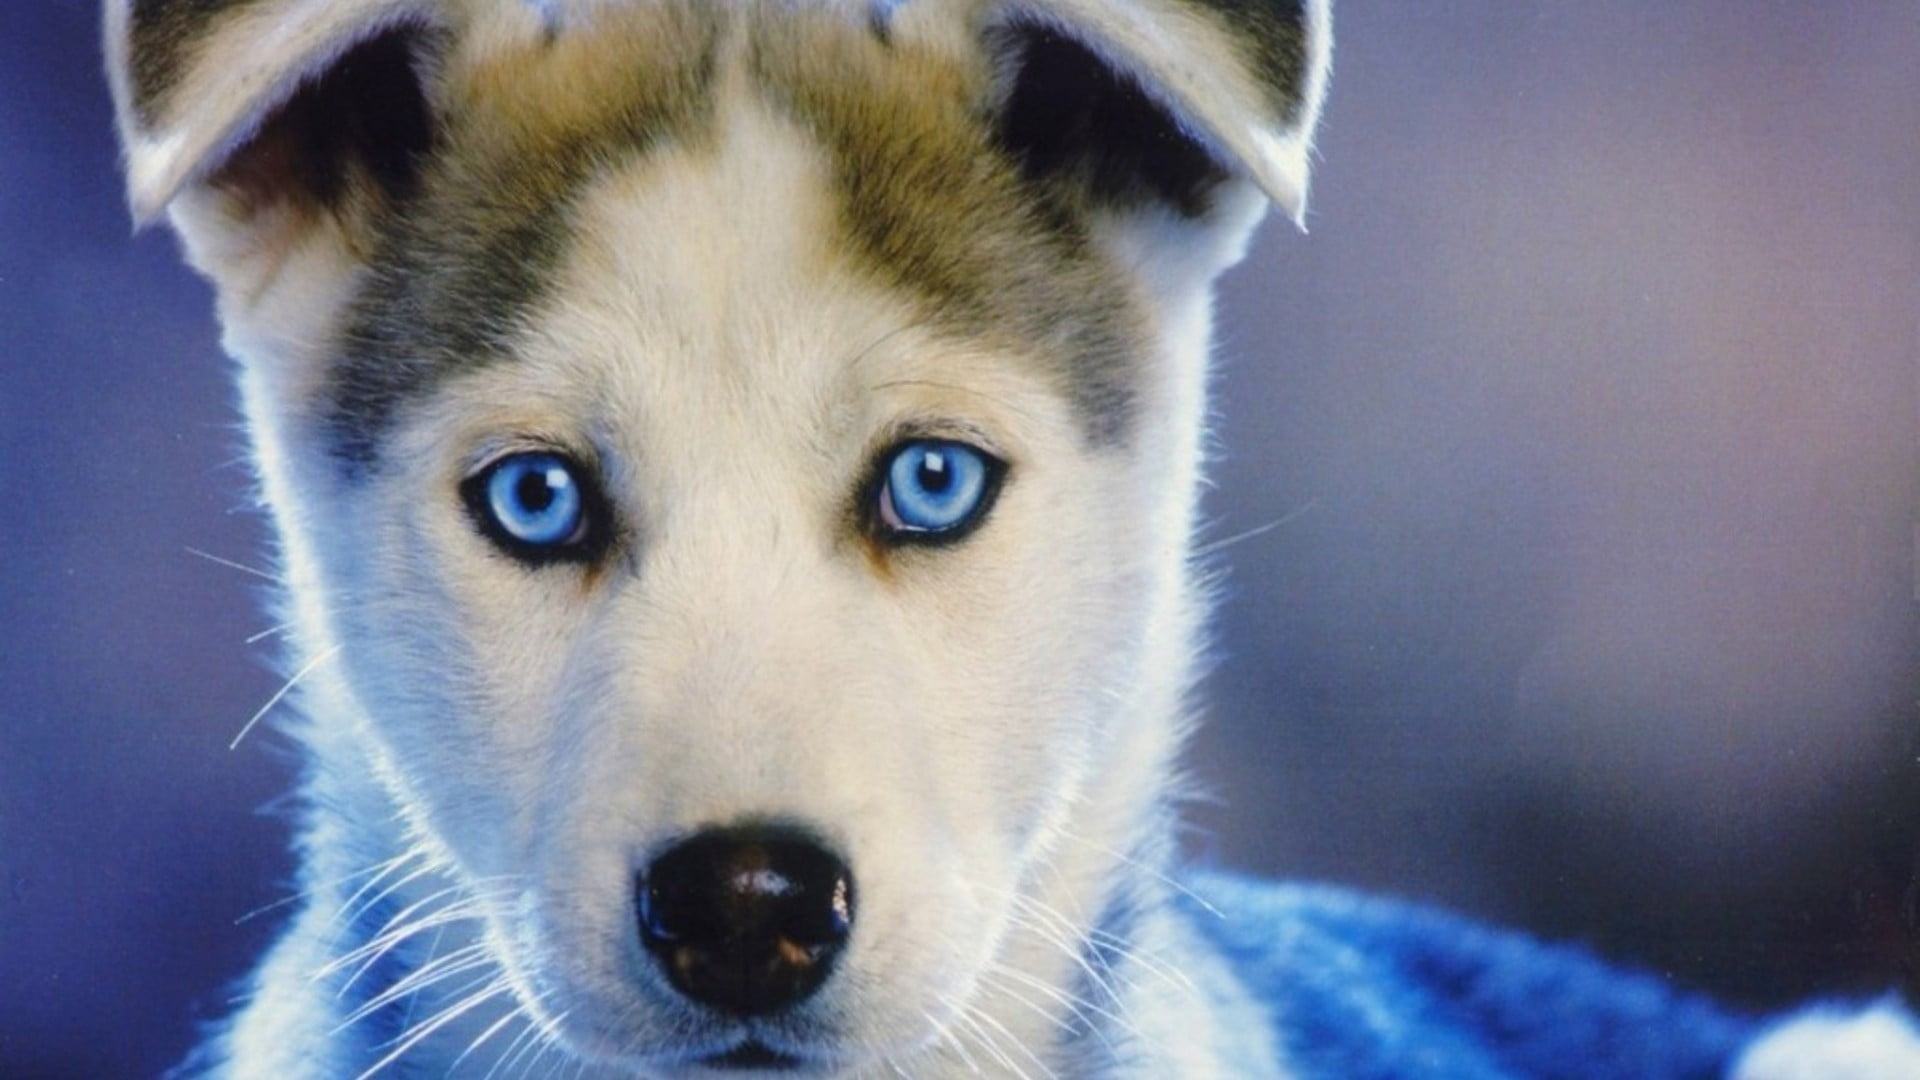 Ideal Brown Siberian Husky Siberian Husky Blue Blue D Dogs Go Blind Blue D Dogs That Don T Shed Brown Siberian Husky Siberian Husky Blue bark post Blue Eyed Dogs